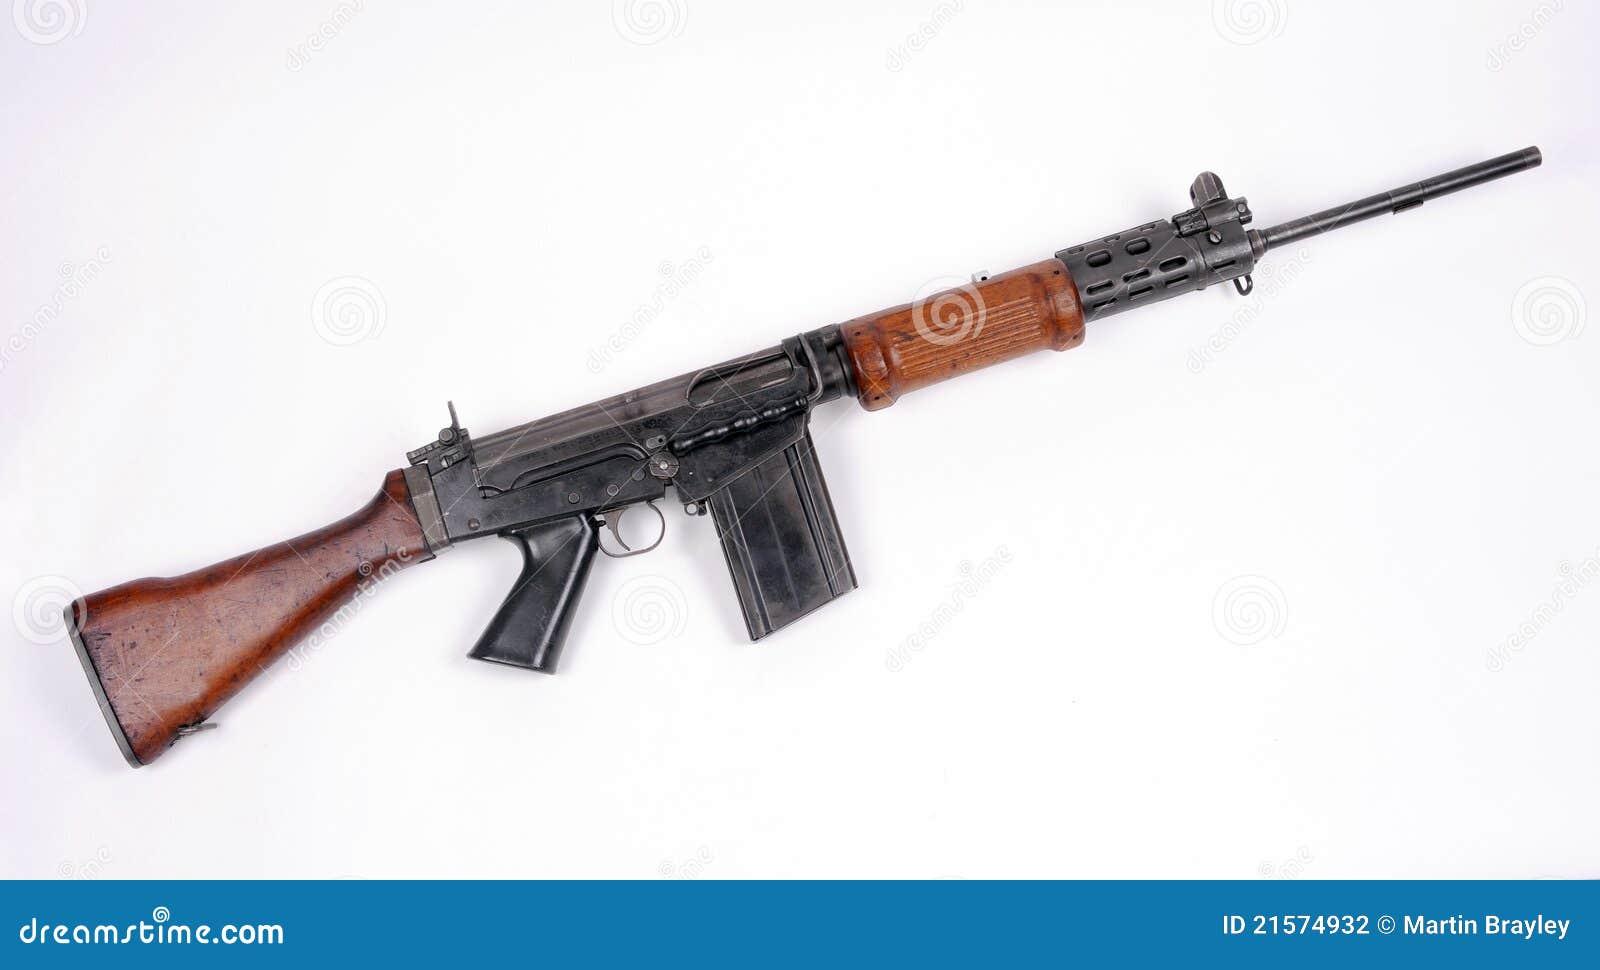 fucile di assalto israeliano f n fal fotografia stock AR-15 Assault Rifle Vector Assault Rifle Halo